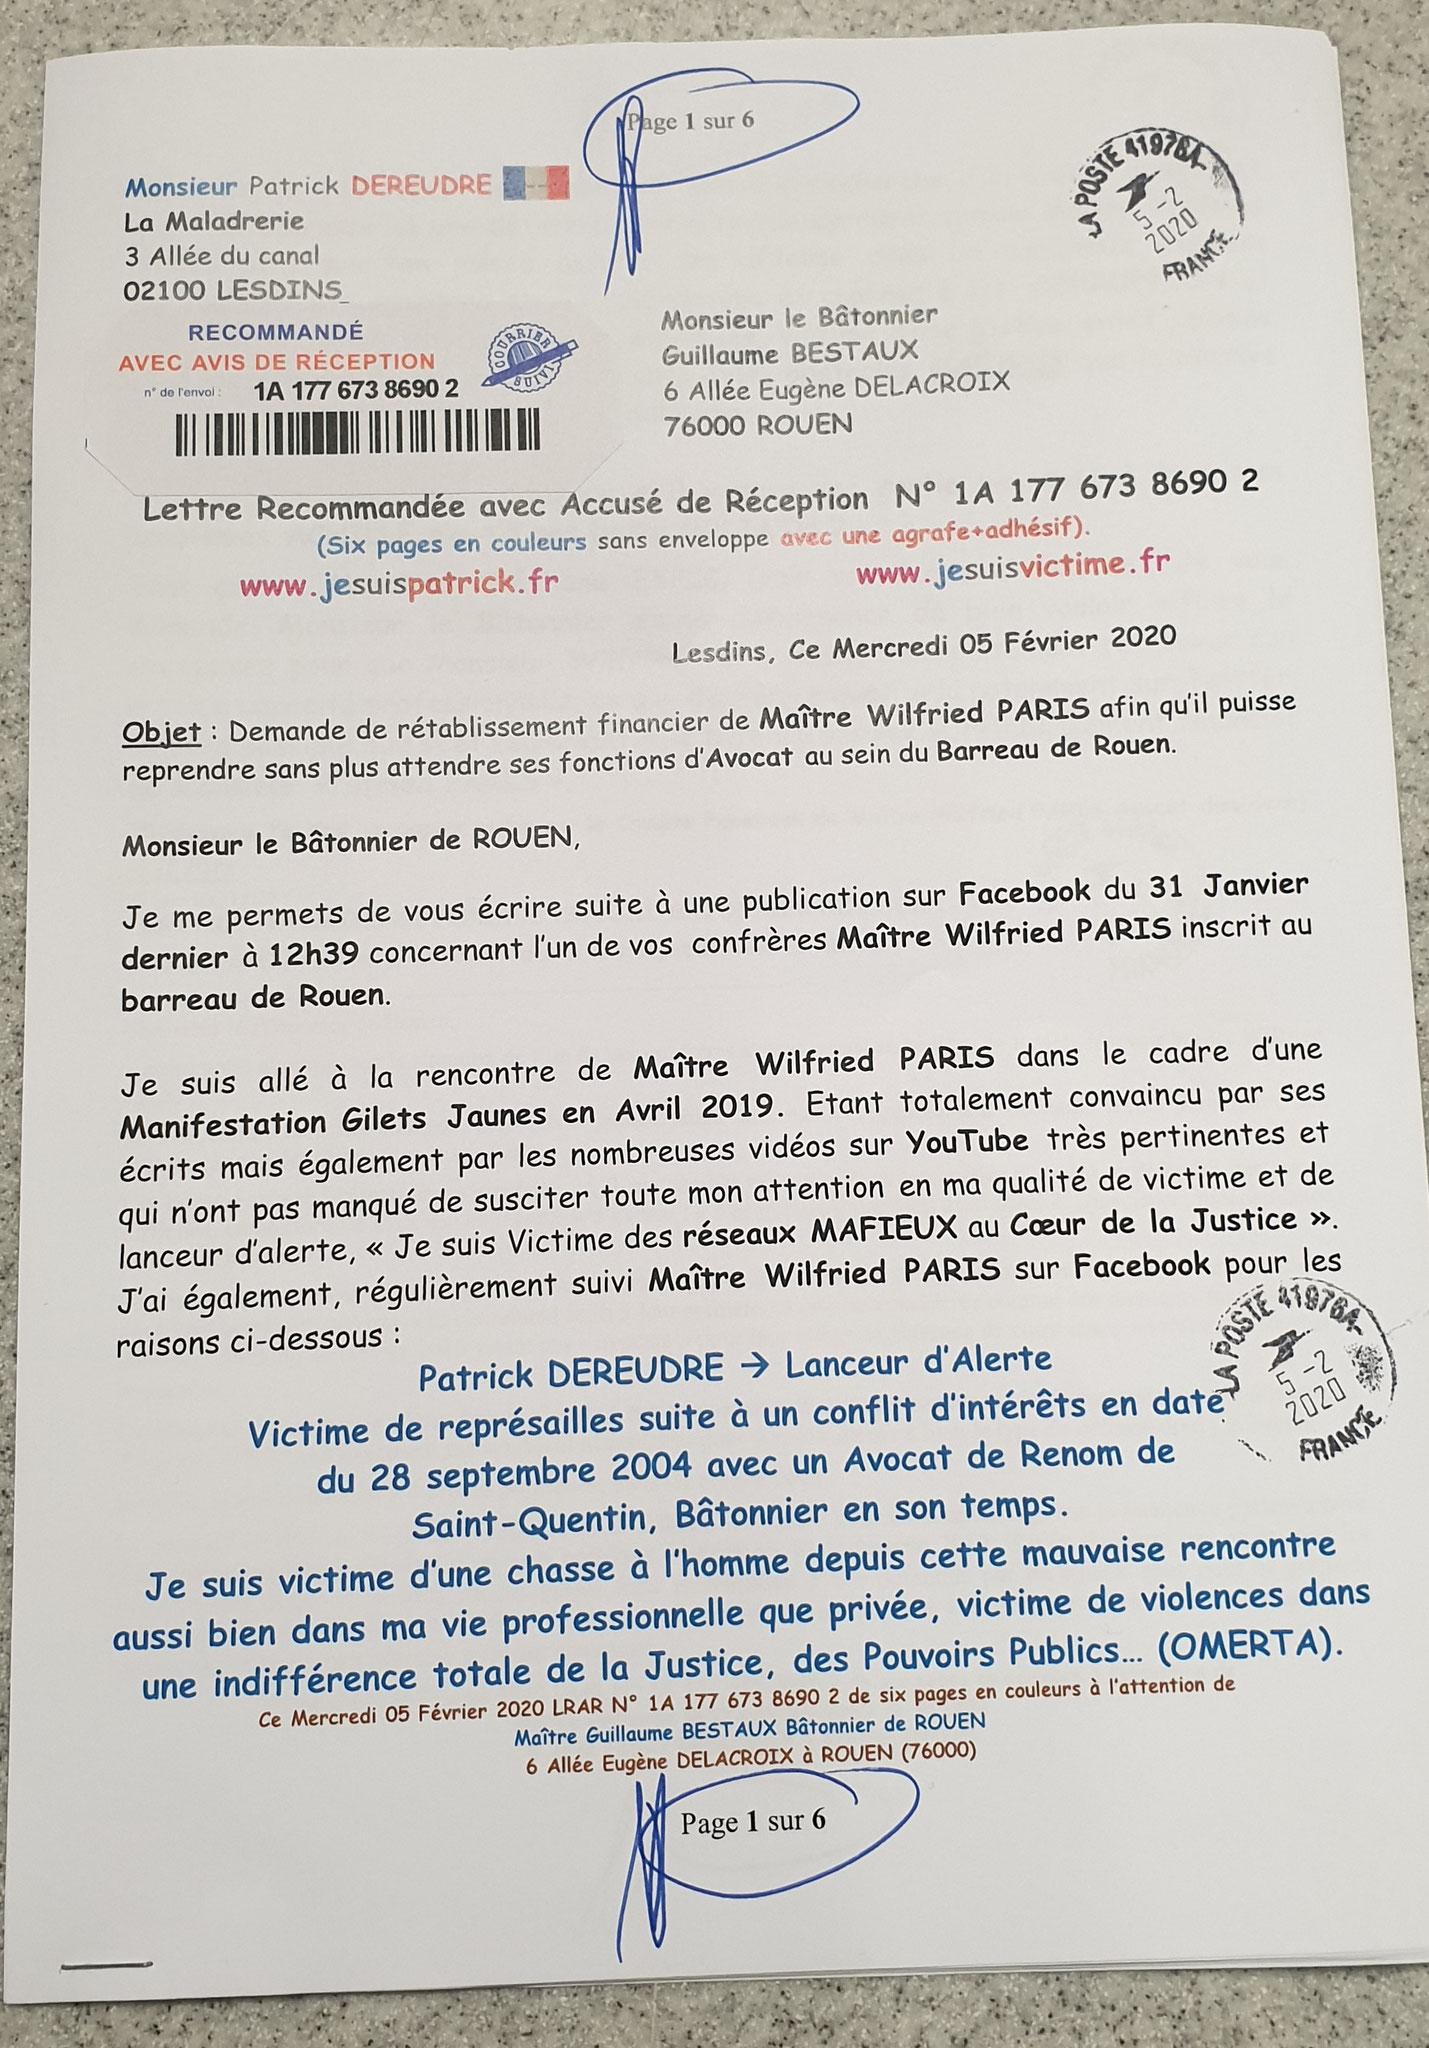 Ma lettre recommandée du 05 Février 2020 N° 1A 177 673 8690 2 Page 1 sur 6 en couleurs www.jesuispatrick.fr www.jesuisvictime.fr www.alerte-rouge-france.fr